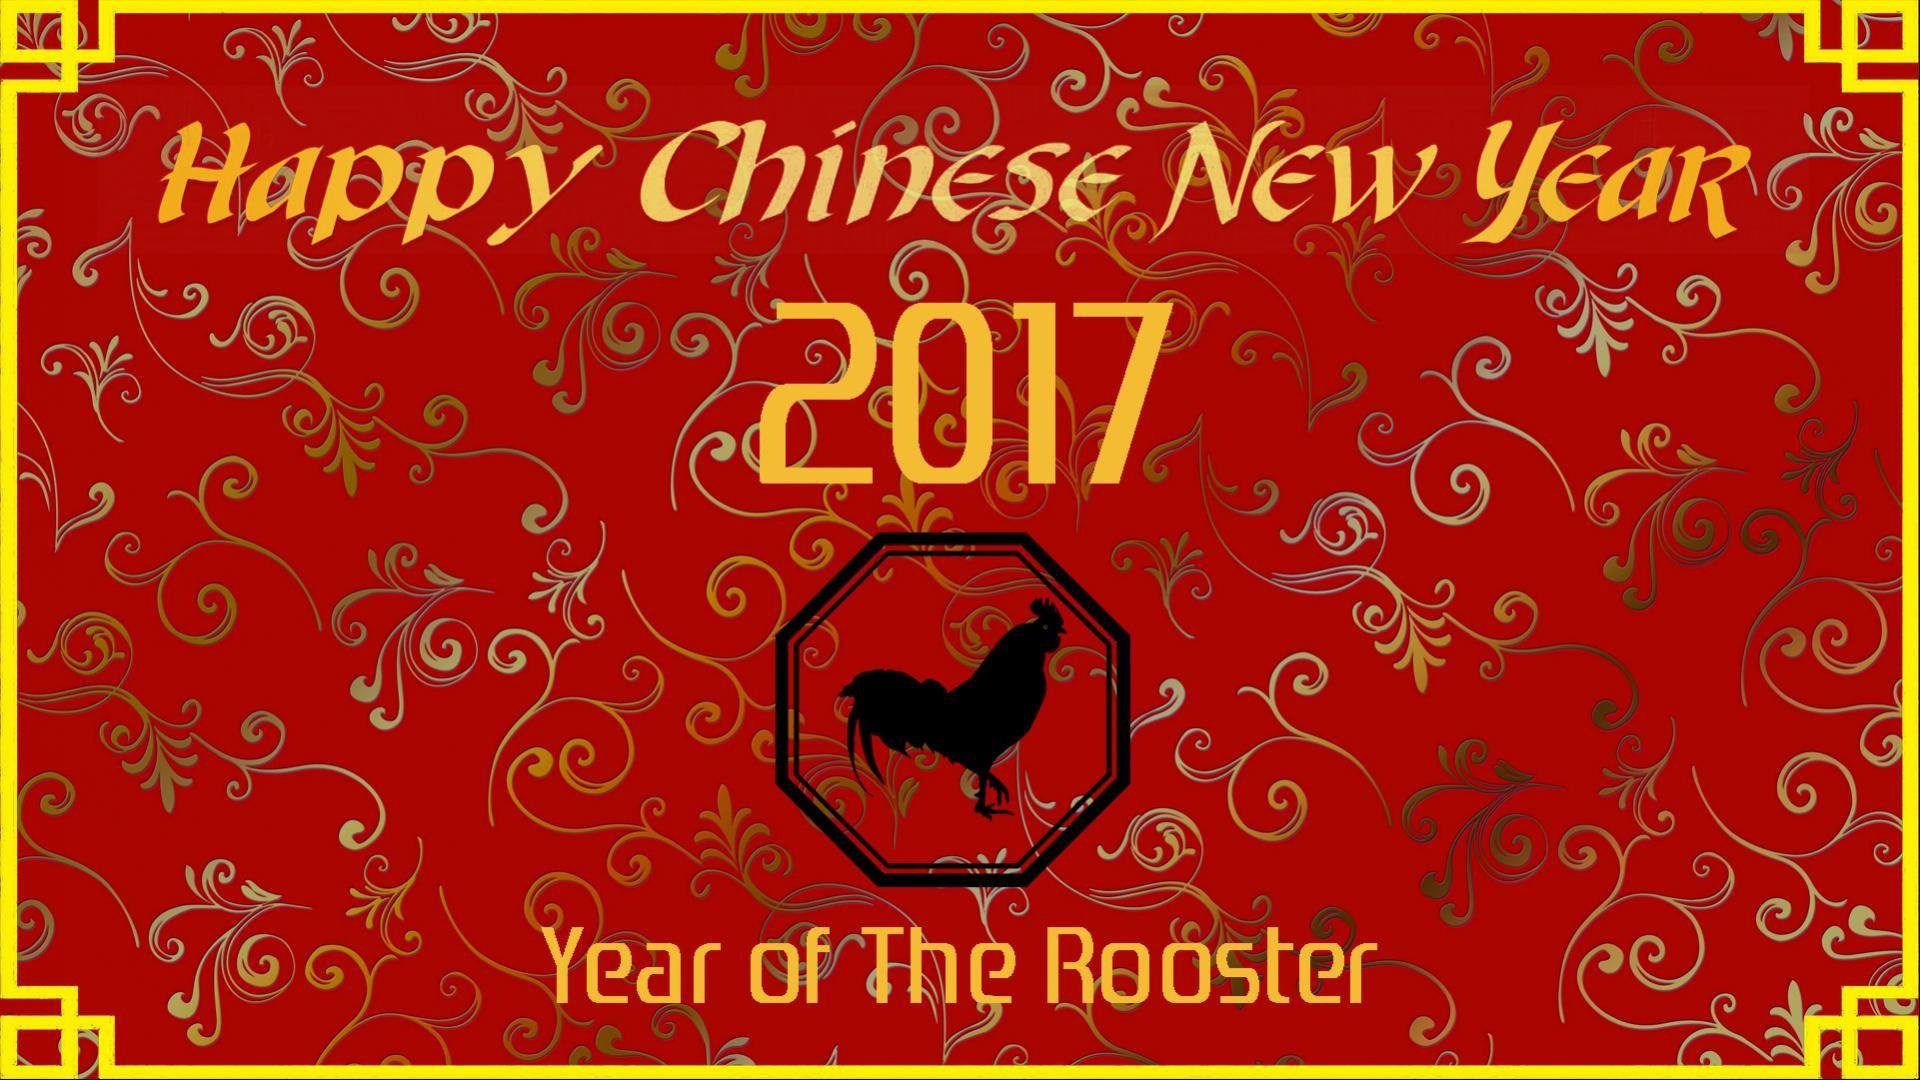 Chinese New Year 2017 Wallpaper hd